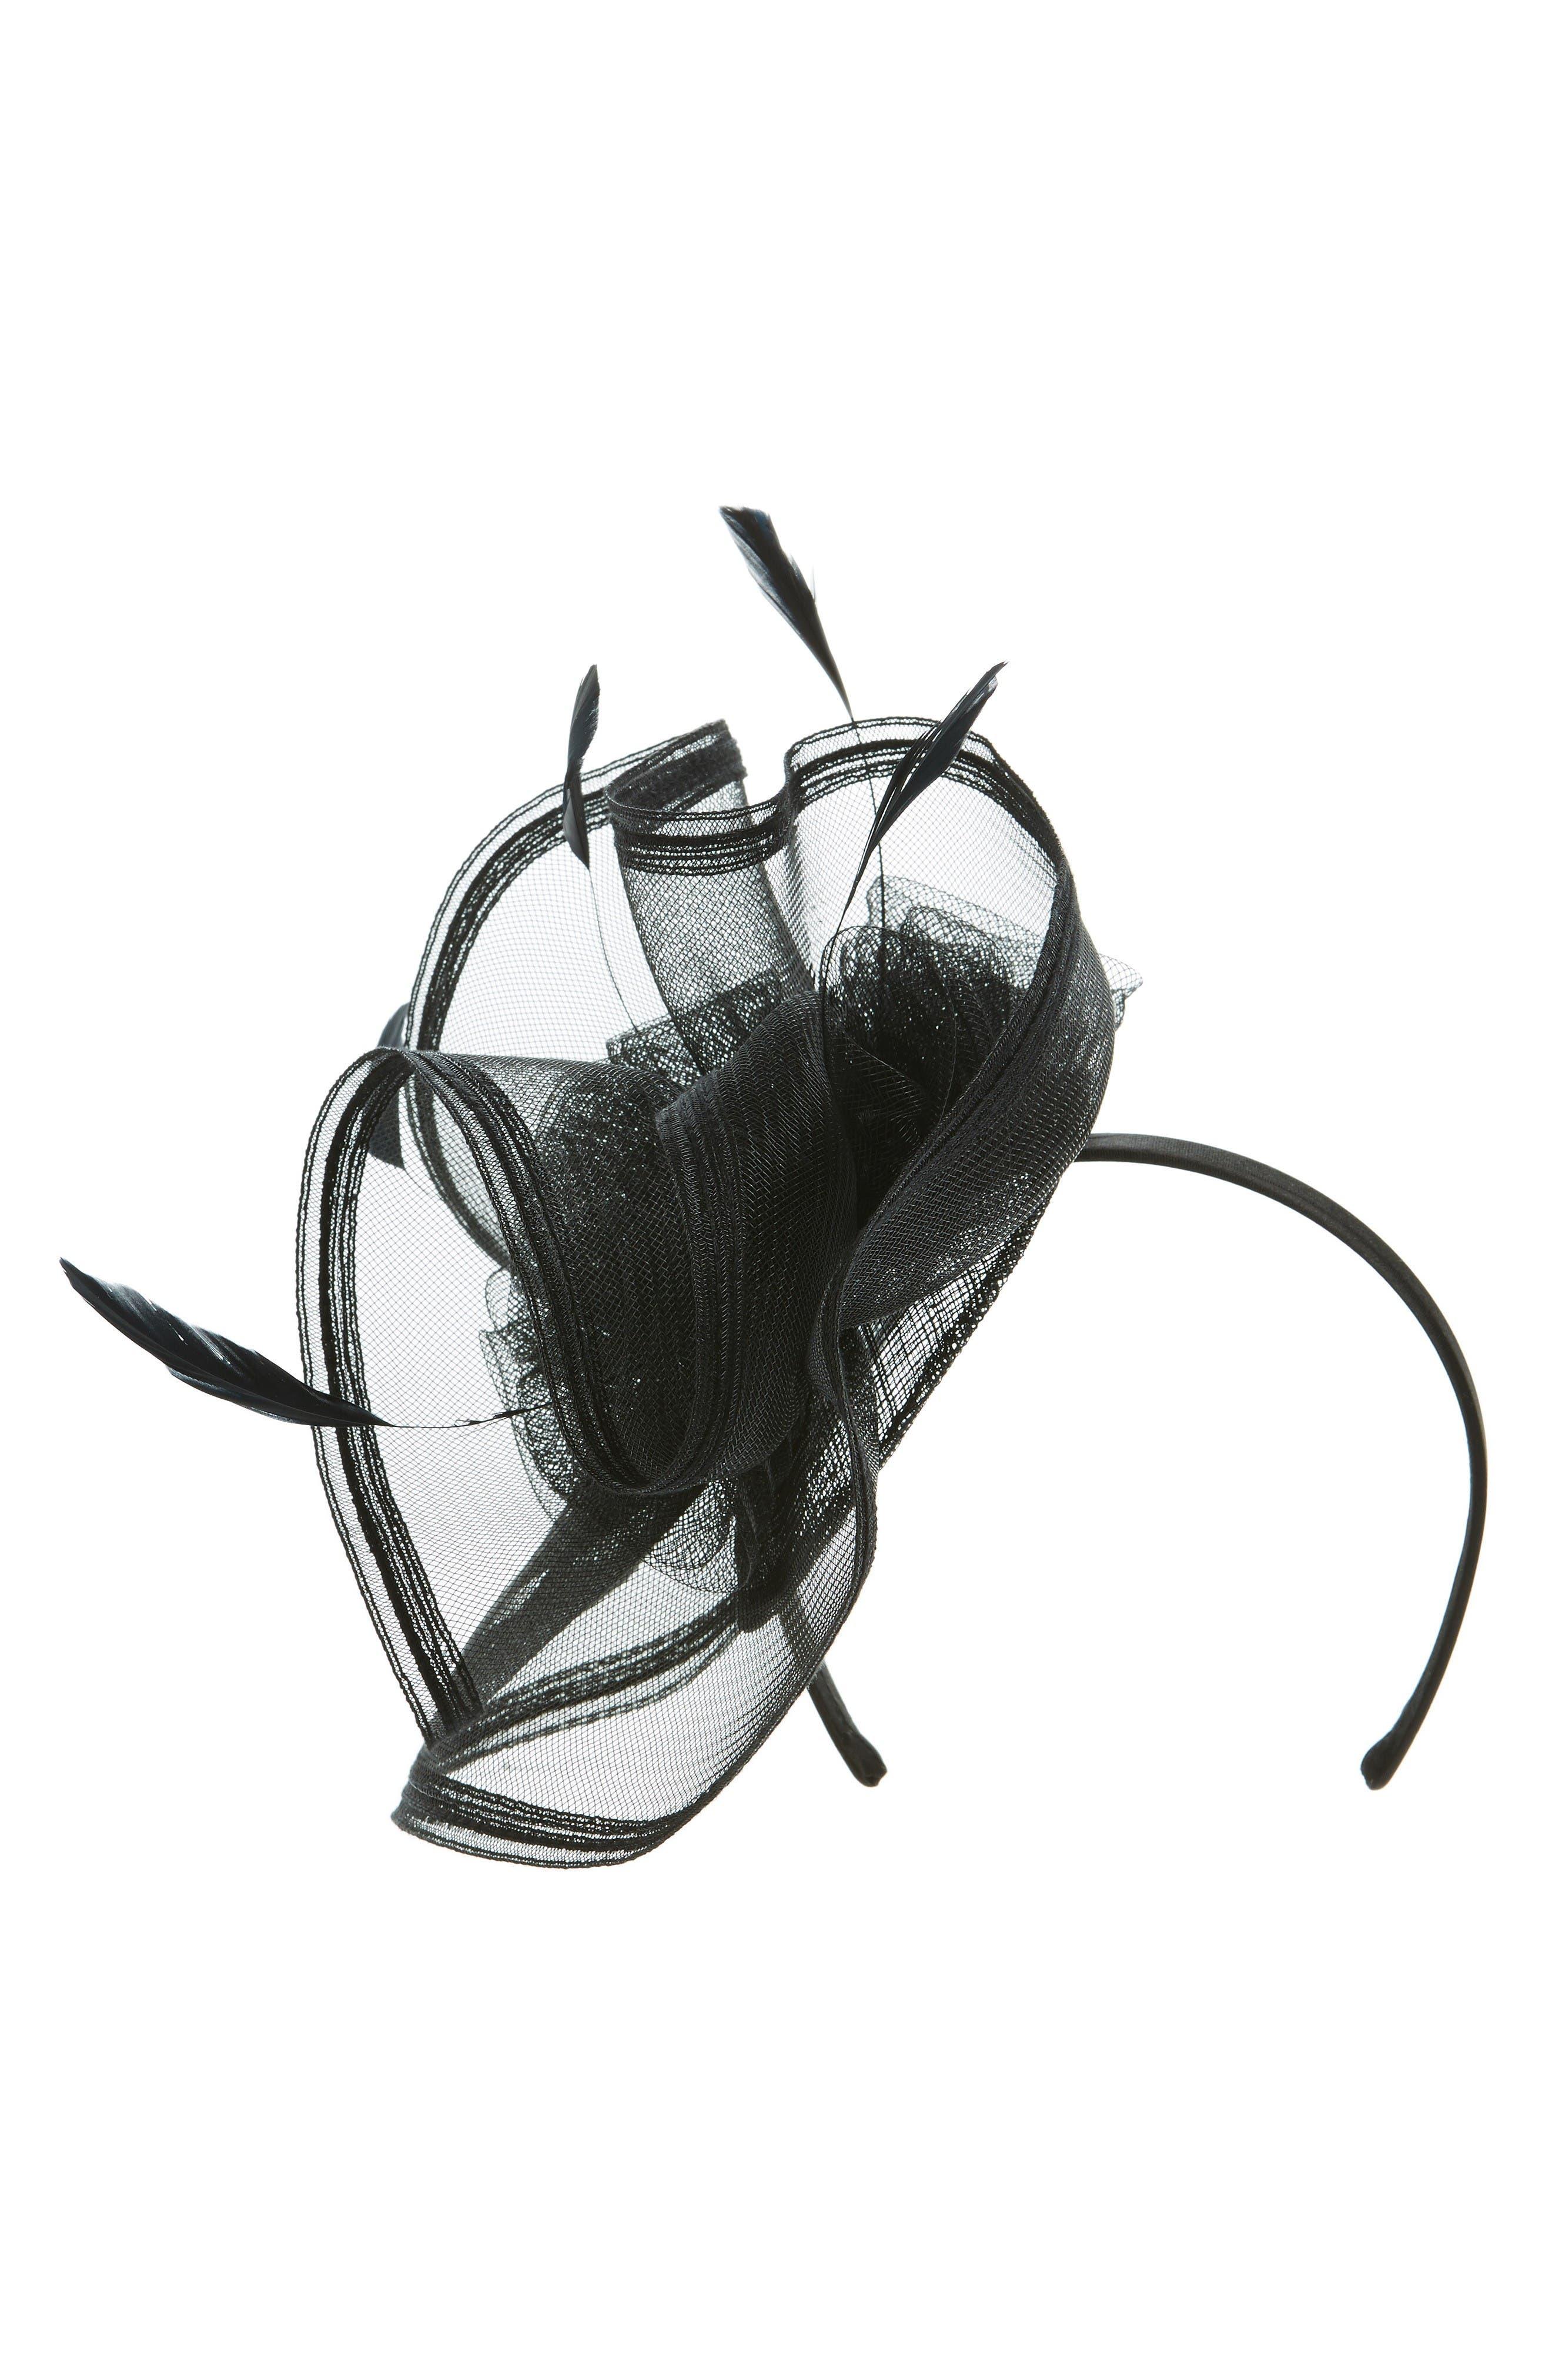 Alternate Image 1 Selected - Nordstrom Border Fascinator Headband